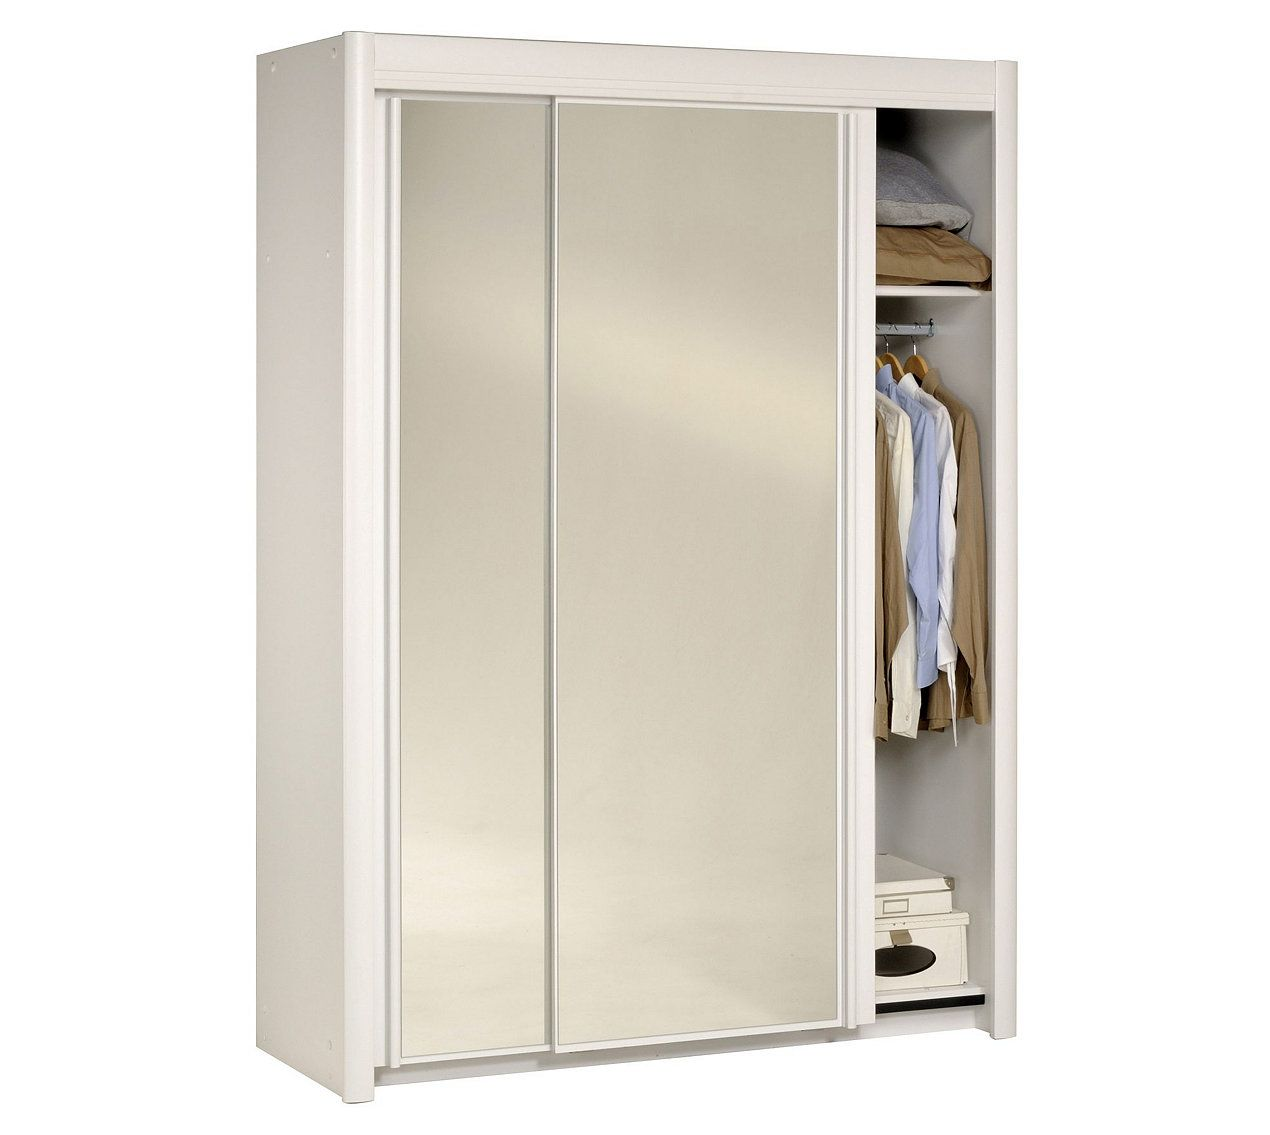 Armoire L 156 Cm Carla 2 4973r161 Blanc Armoires But Ikea Armoire Chambre Armoire Chambre Armoire De Cuisine